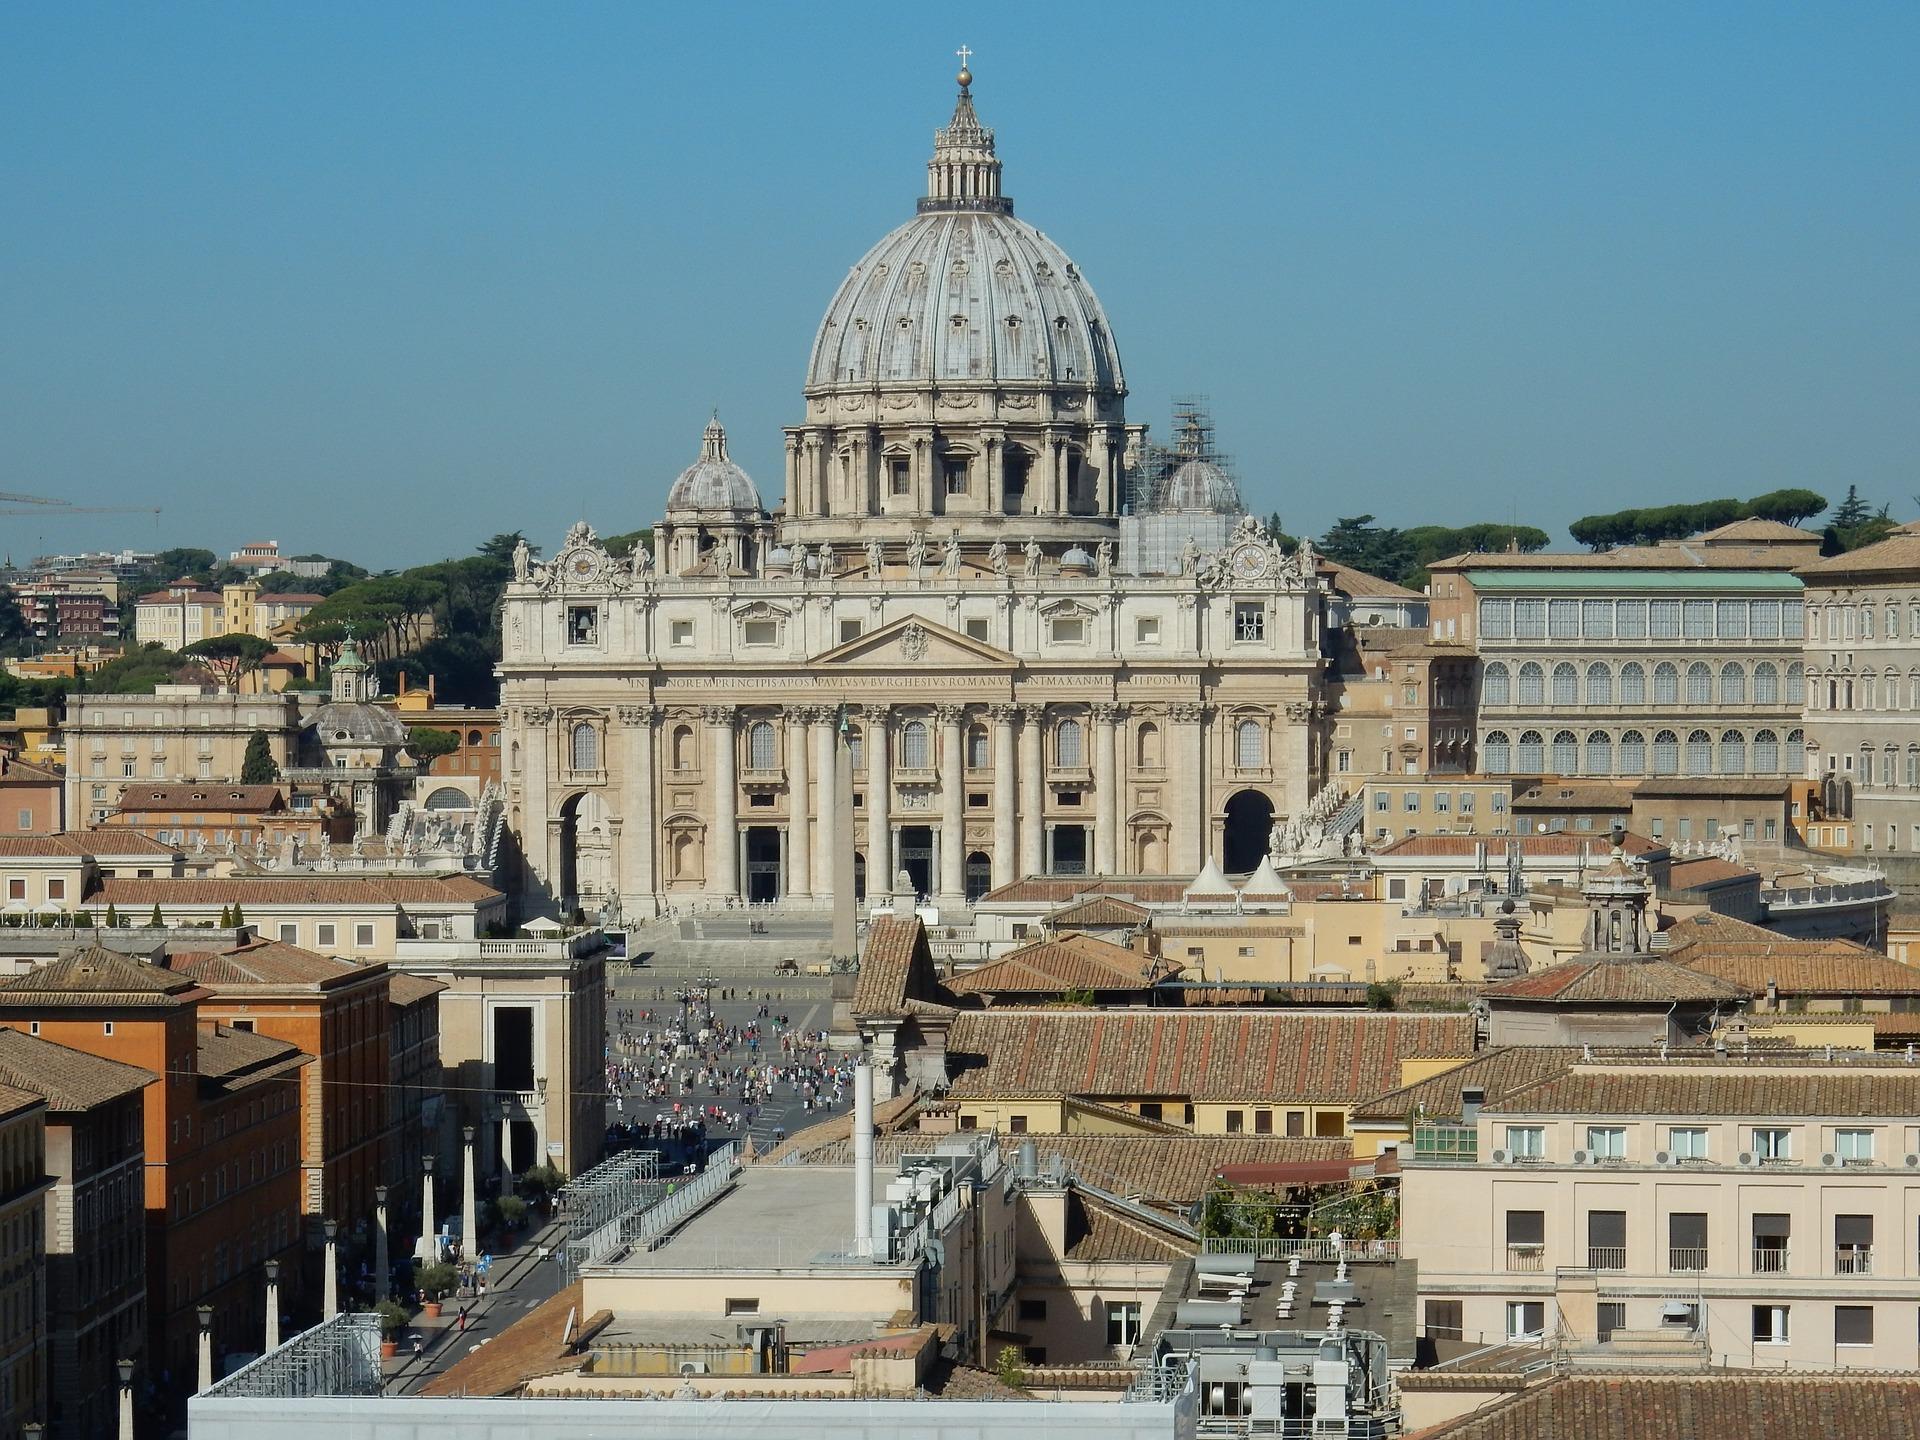 Basílica de San Pedro del Vaticano